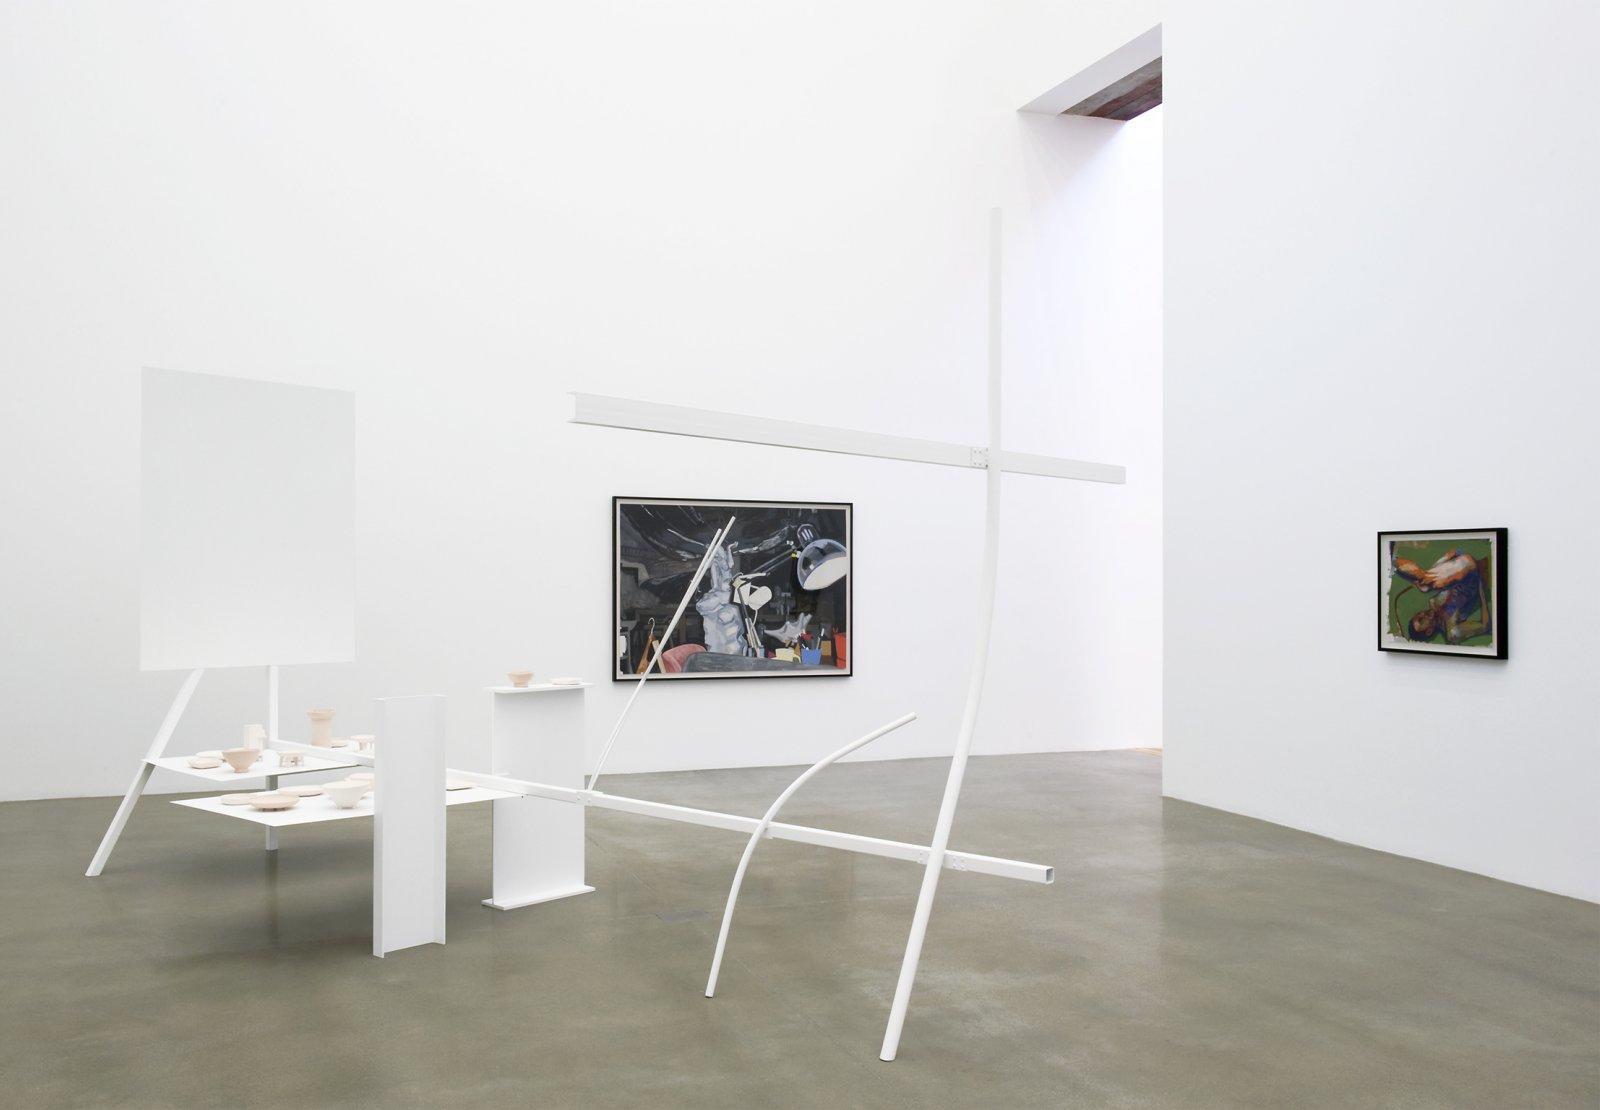 Damian Moppett, Studio at Dawn, 2009, steel, enamel, earthenware, stoneware and glazes, 120 x 124 x 200 in. (305 x 315 x 508 cm). Installation view, Rennie Museum, Vancouver, 2011 by Damian Moppett